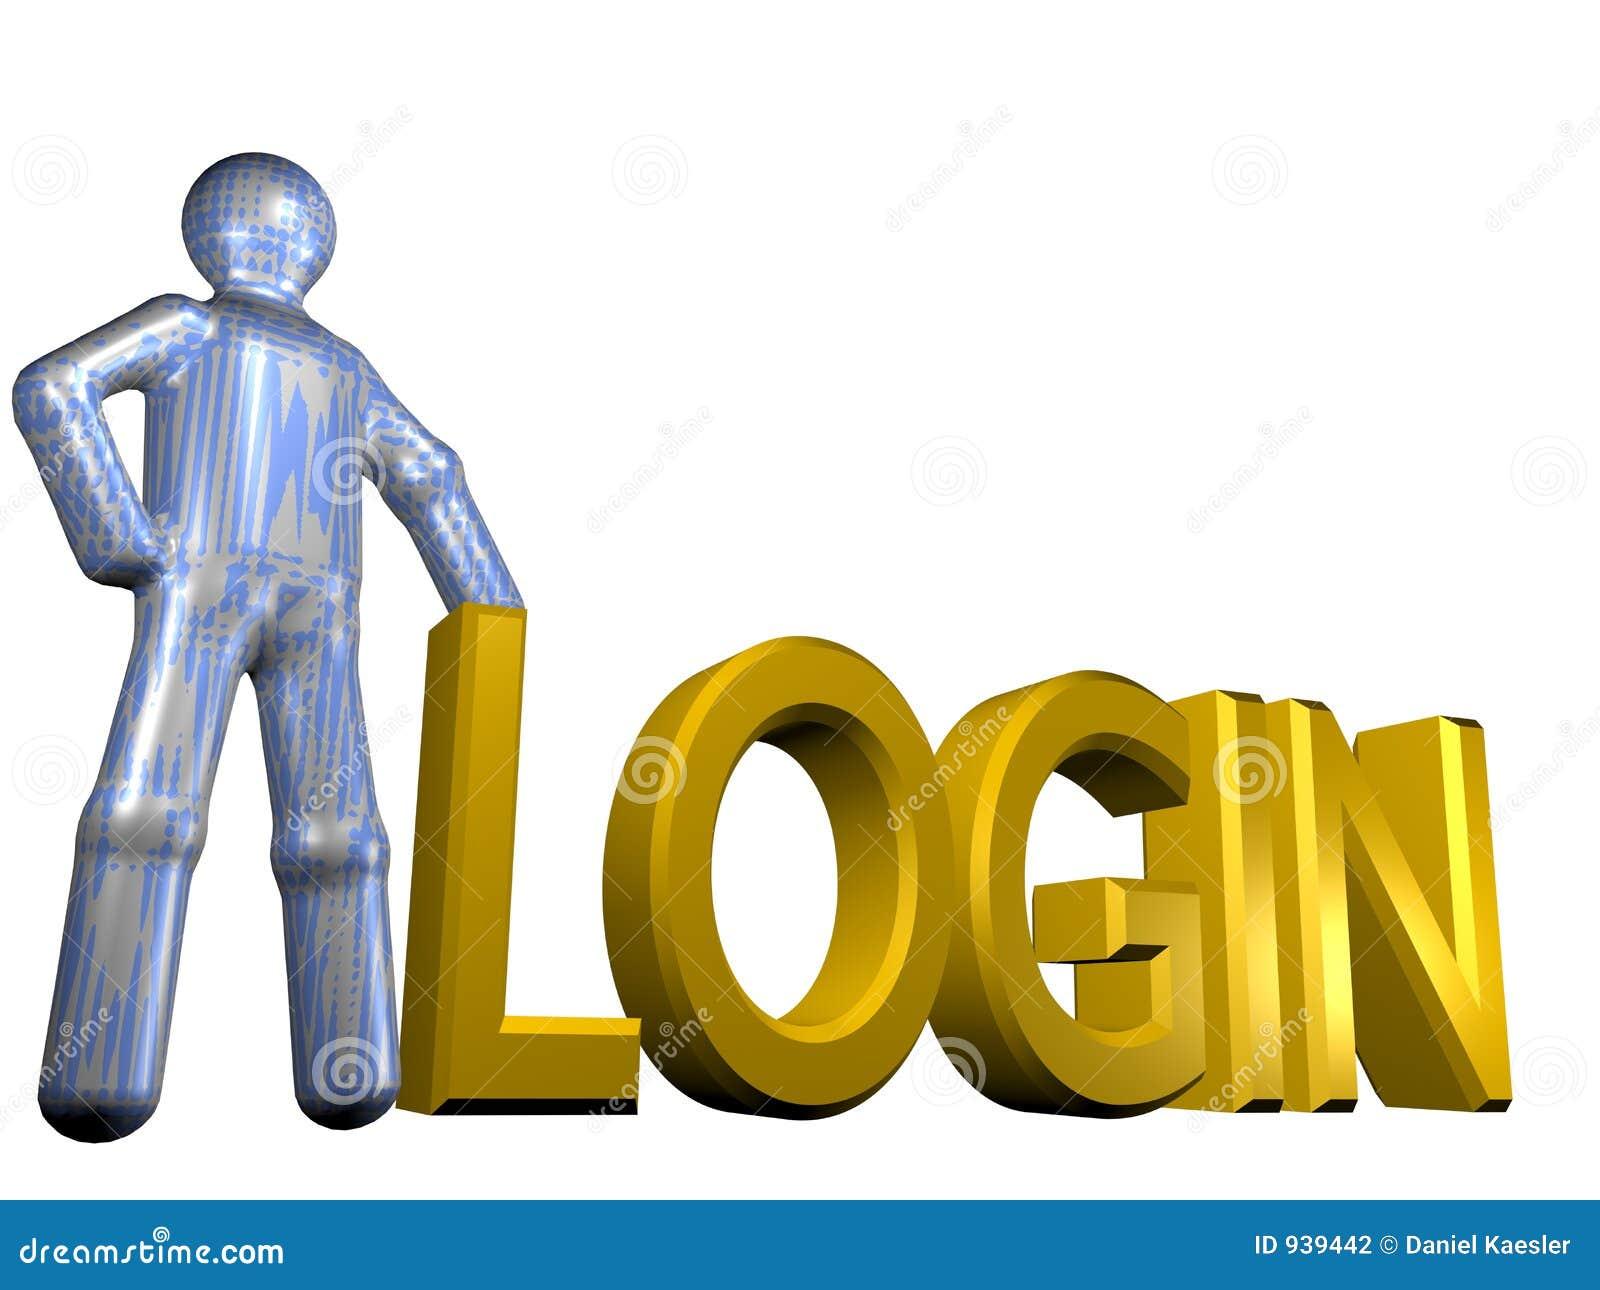 Login 3d Stock Photography Image 939442